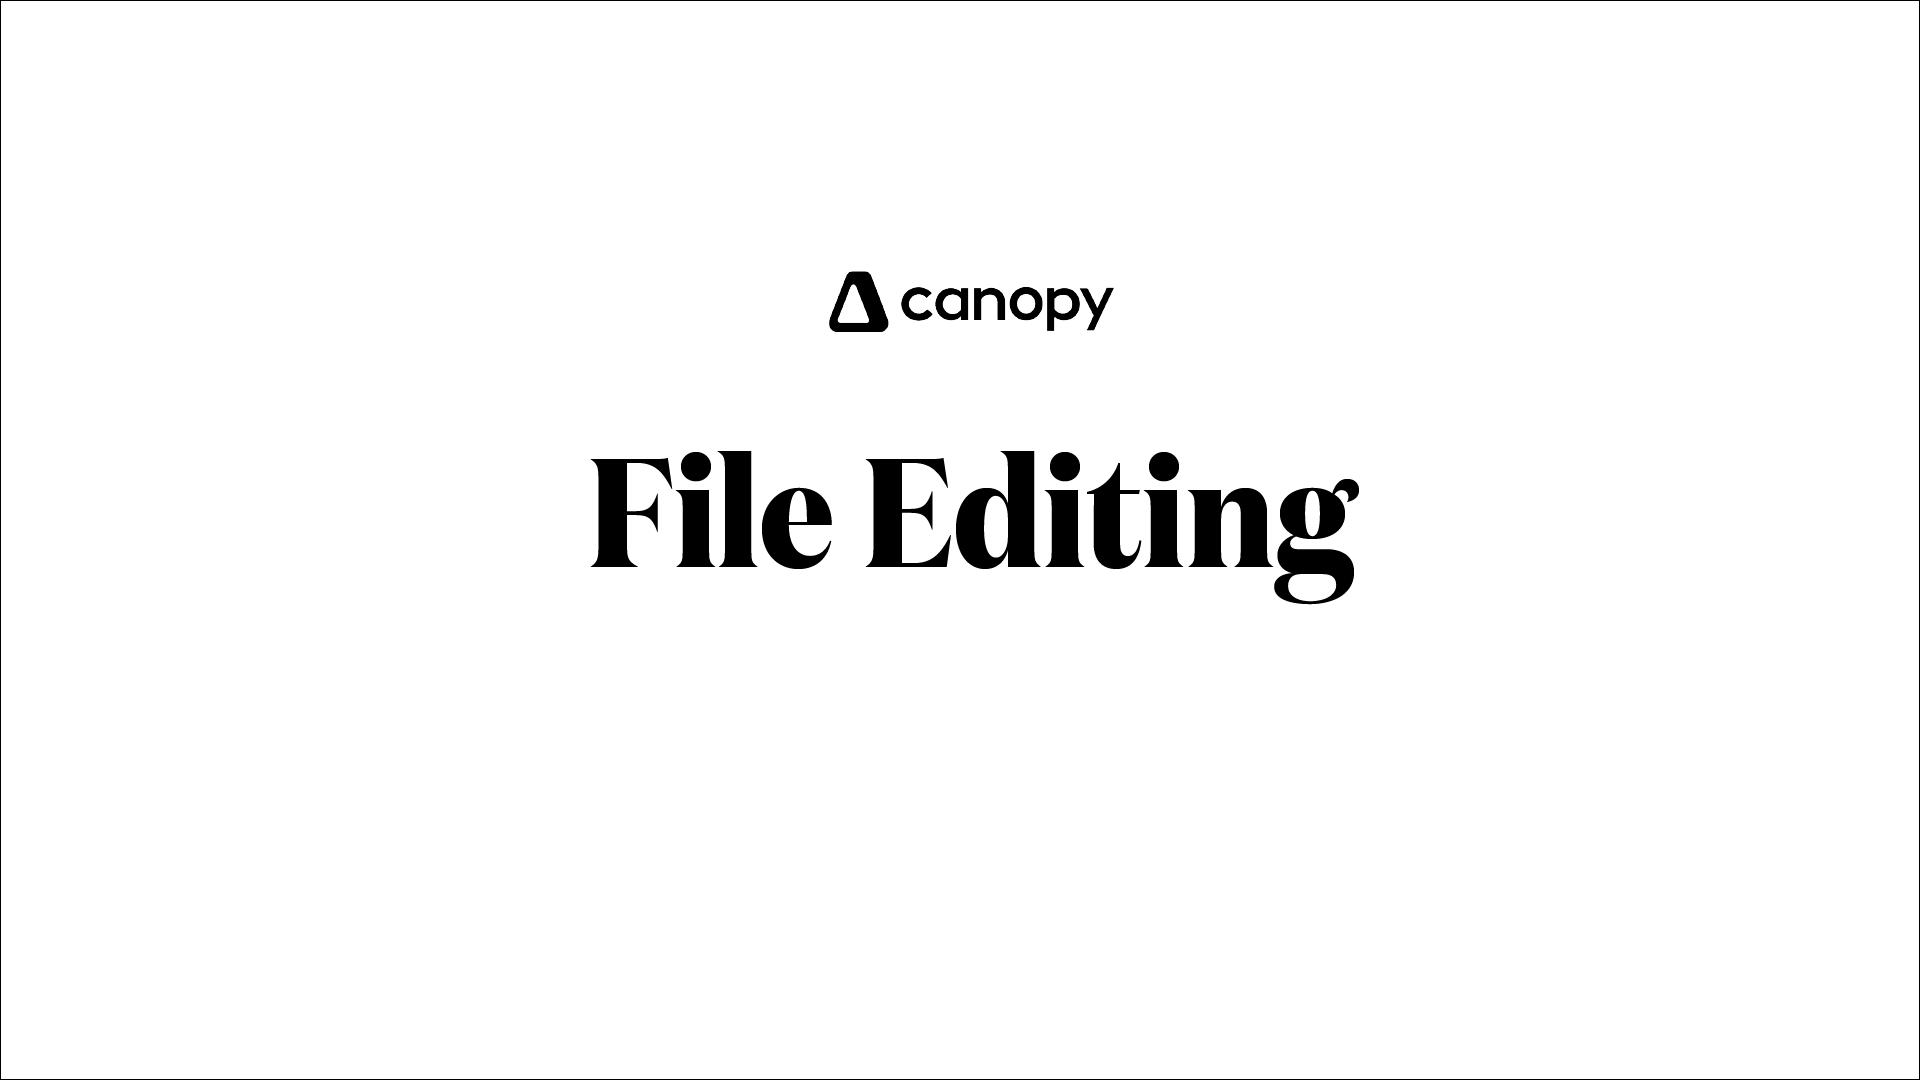 File editing